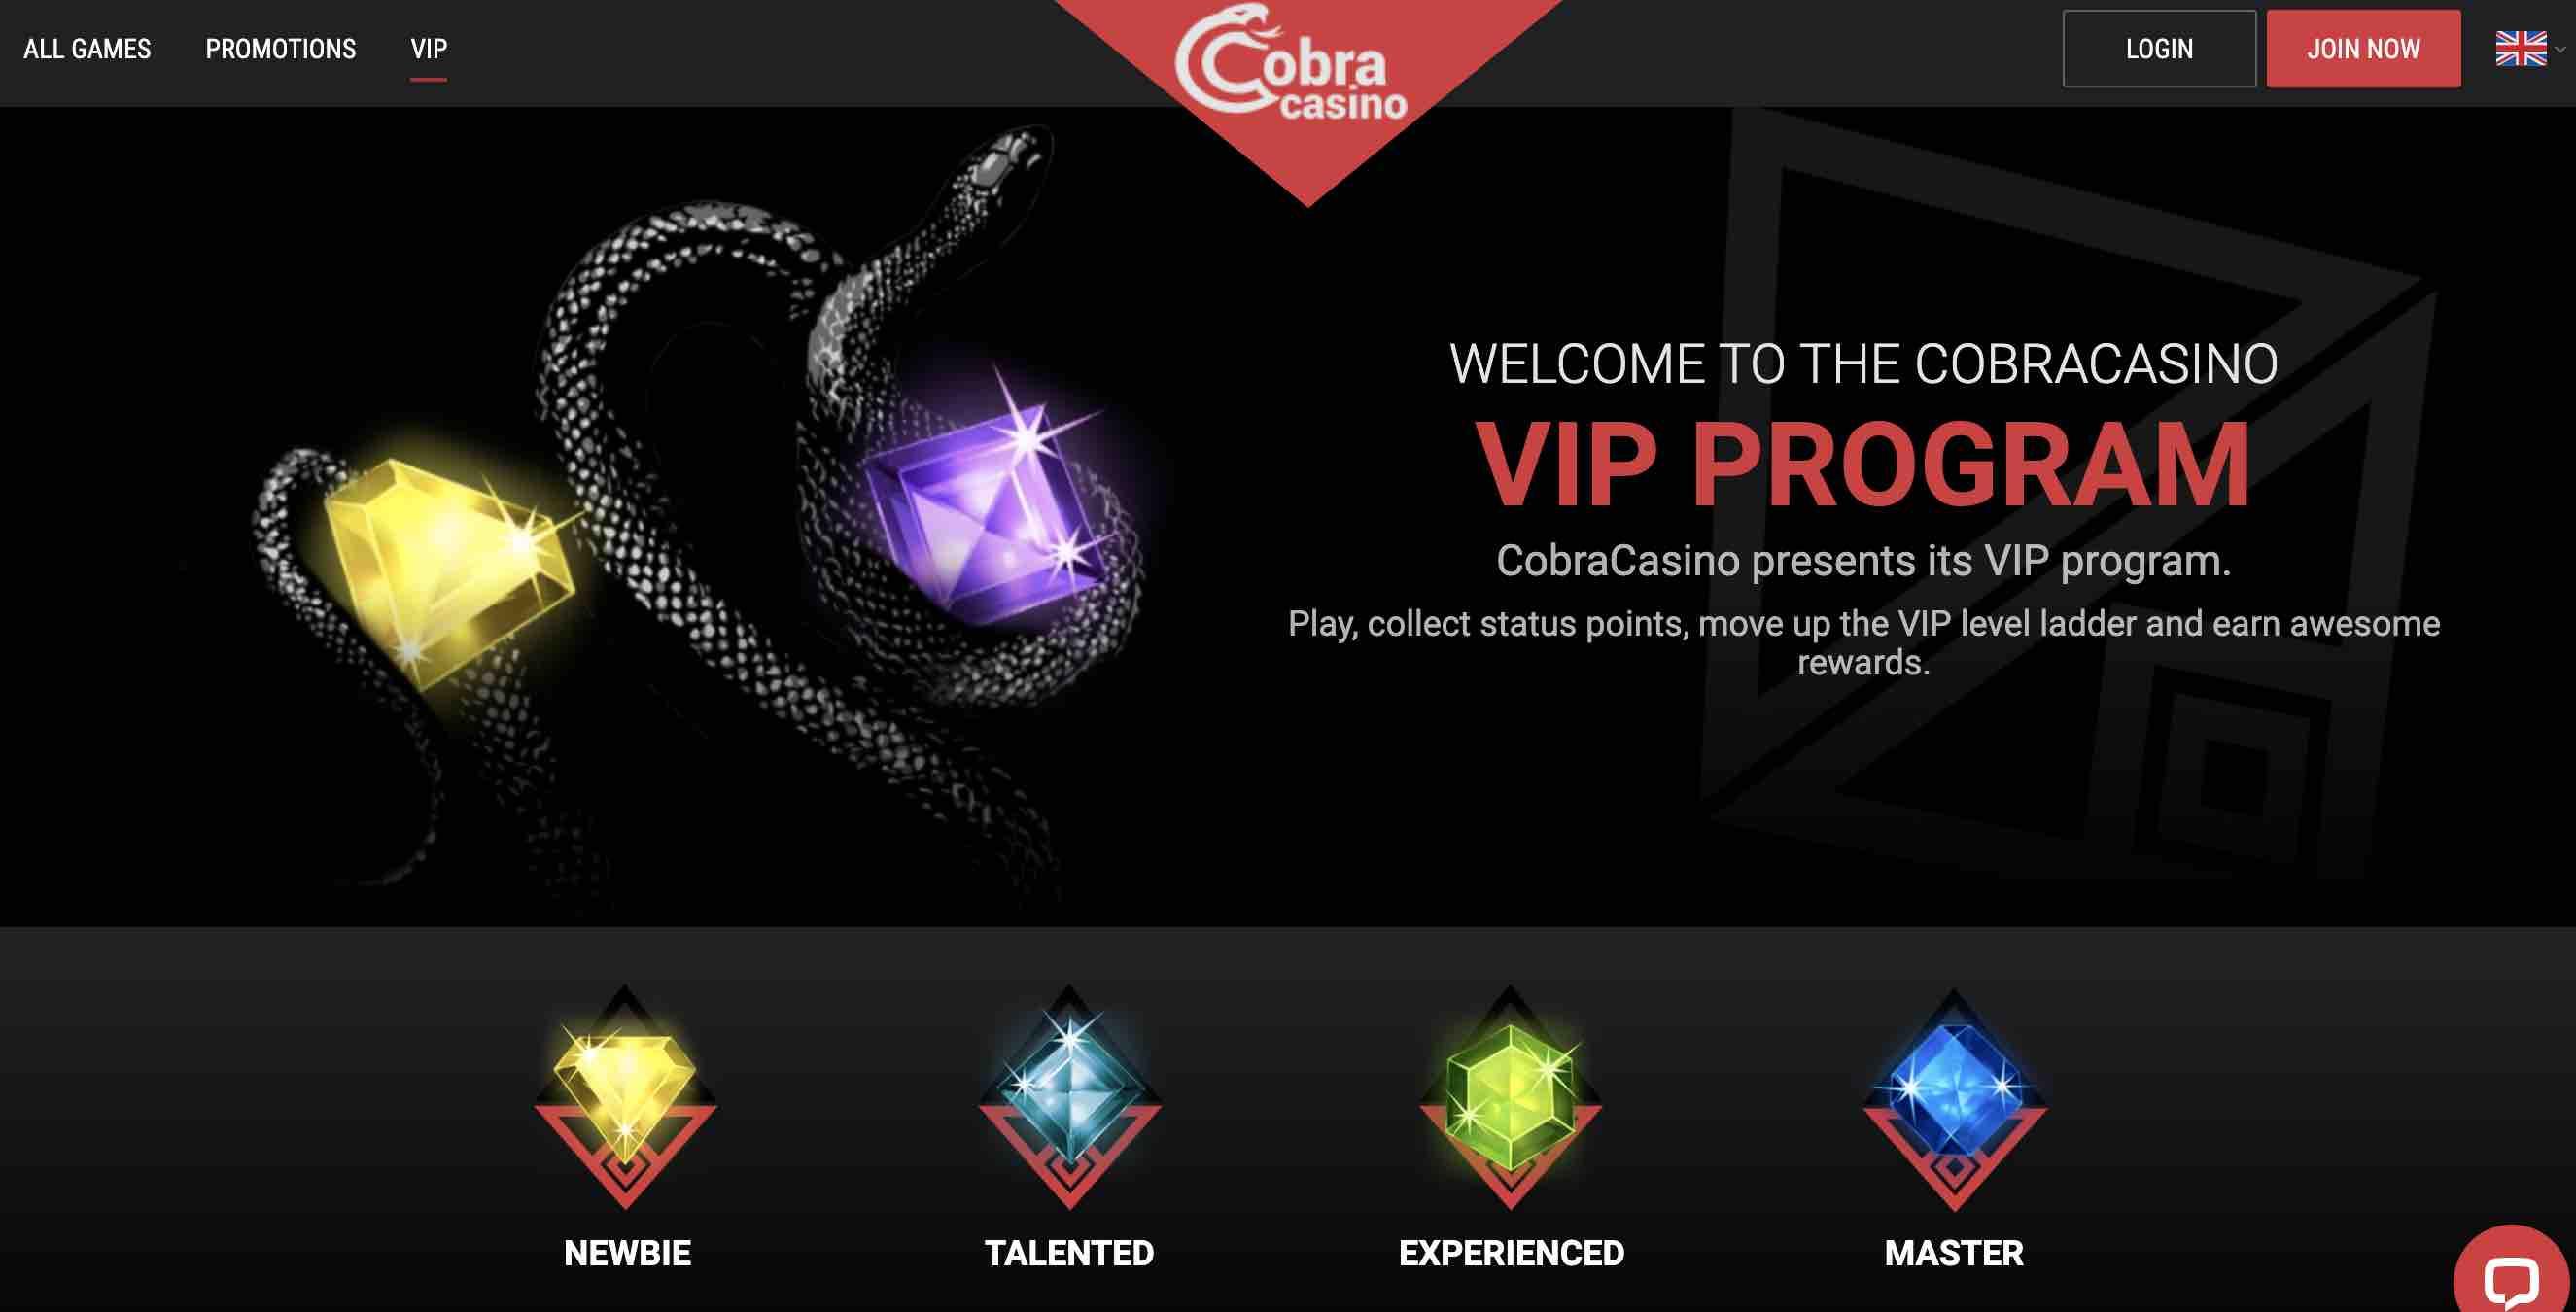 Cobra Casino VIP Program